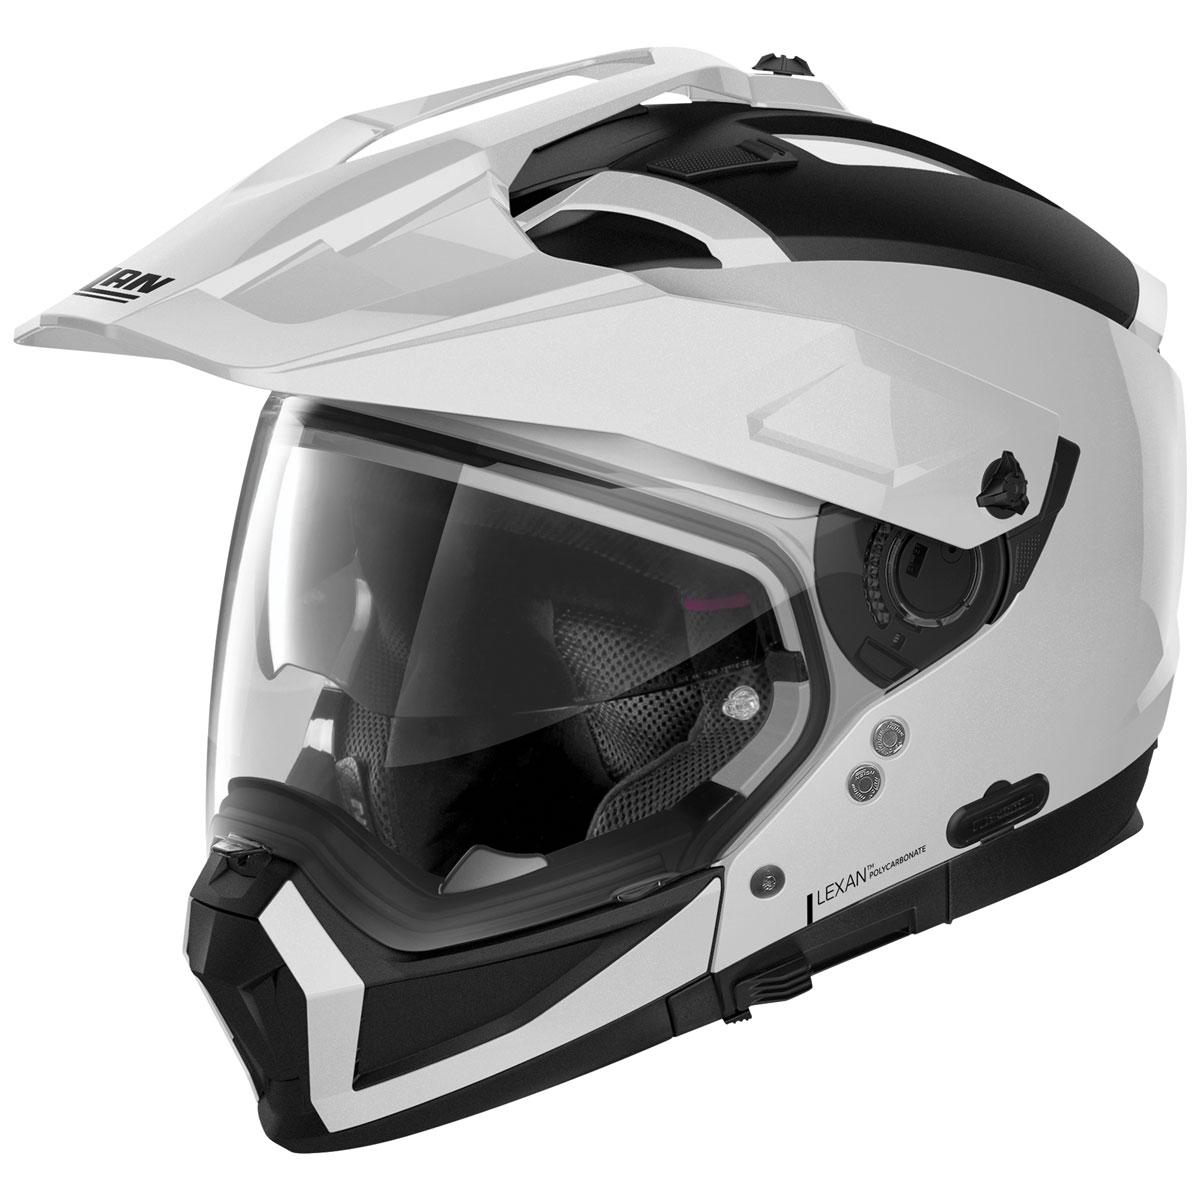 Nolan N70-2 X Metal White Dual Sport Helmet